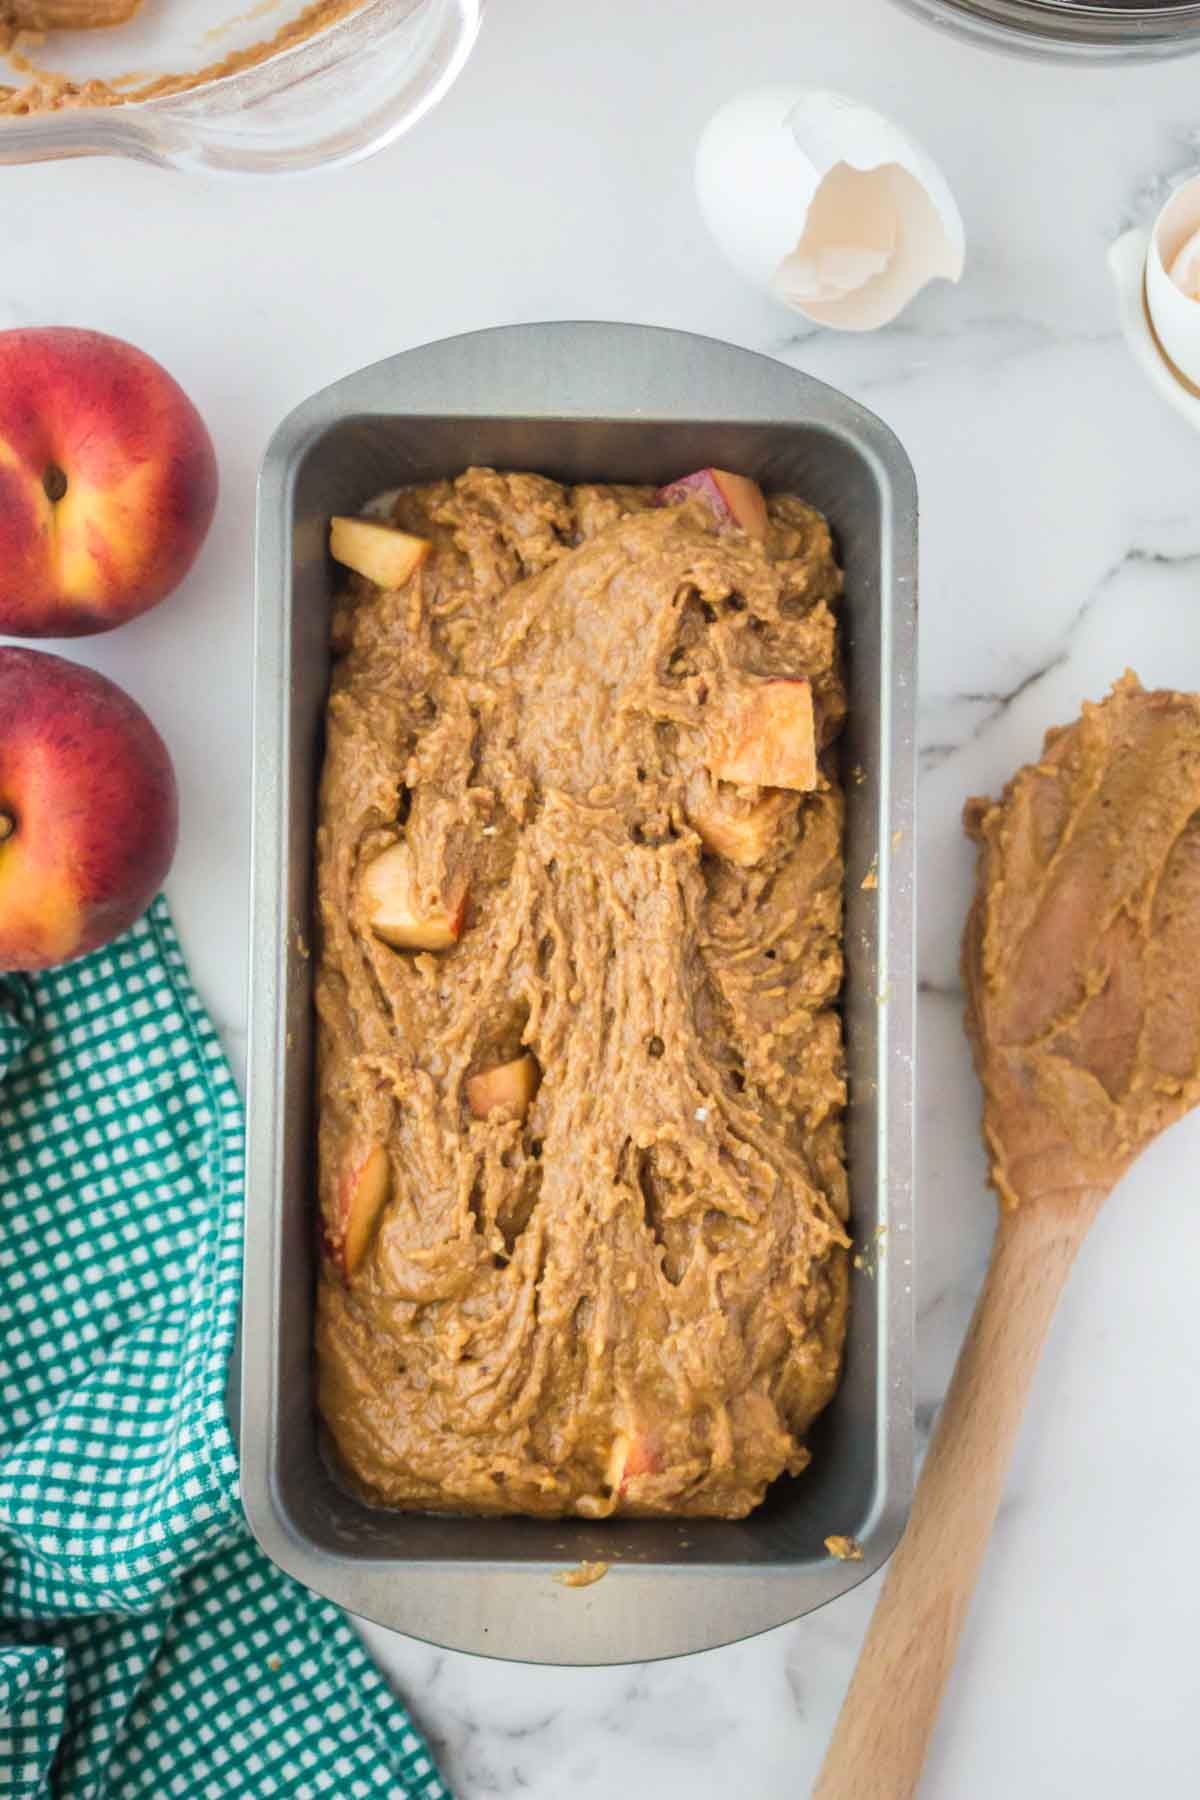 Peach bread batter in a pan.